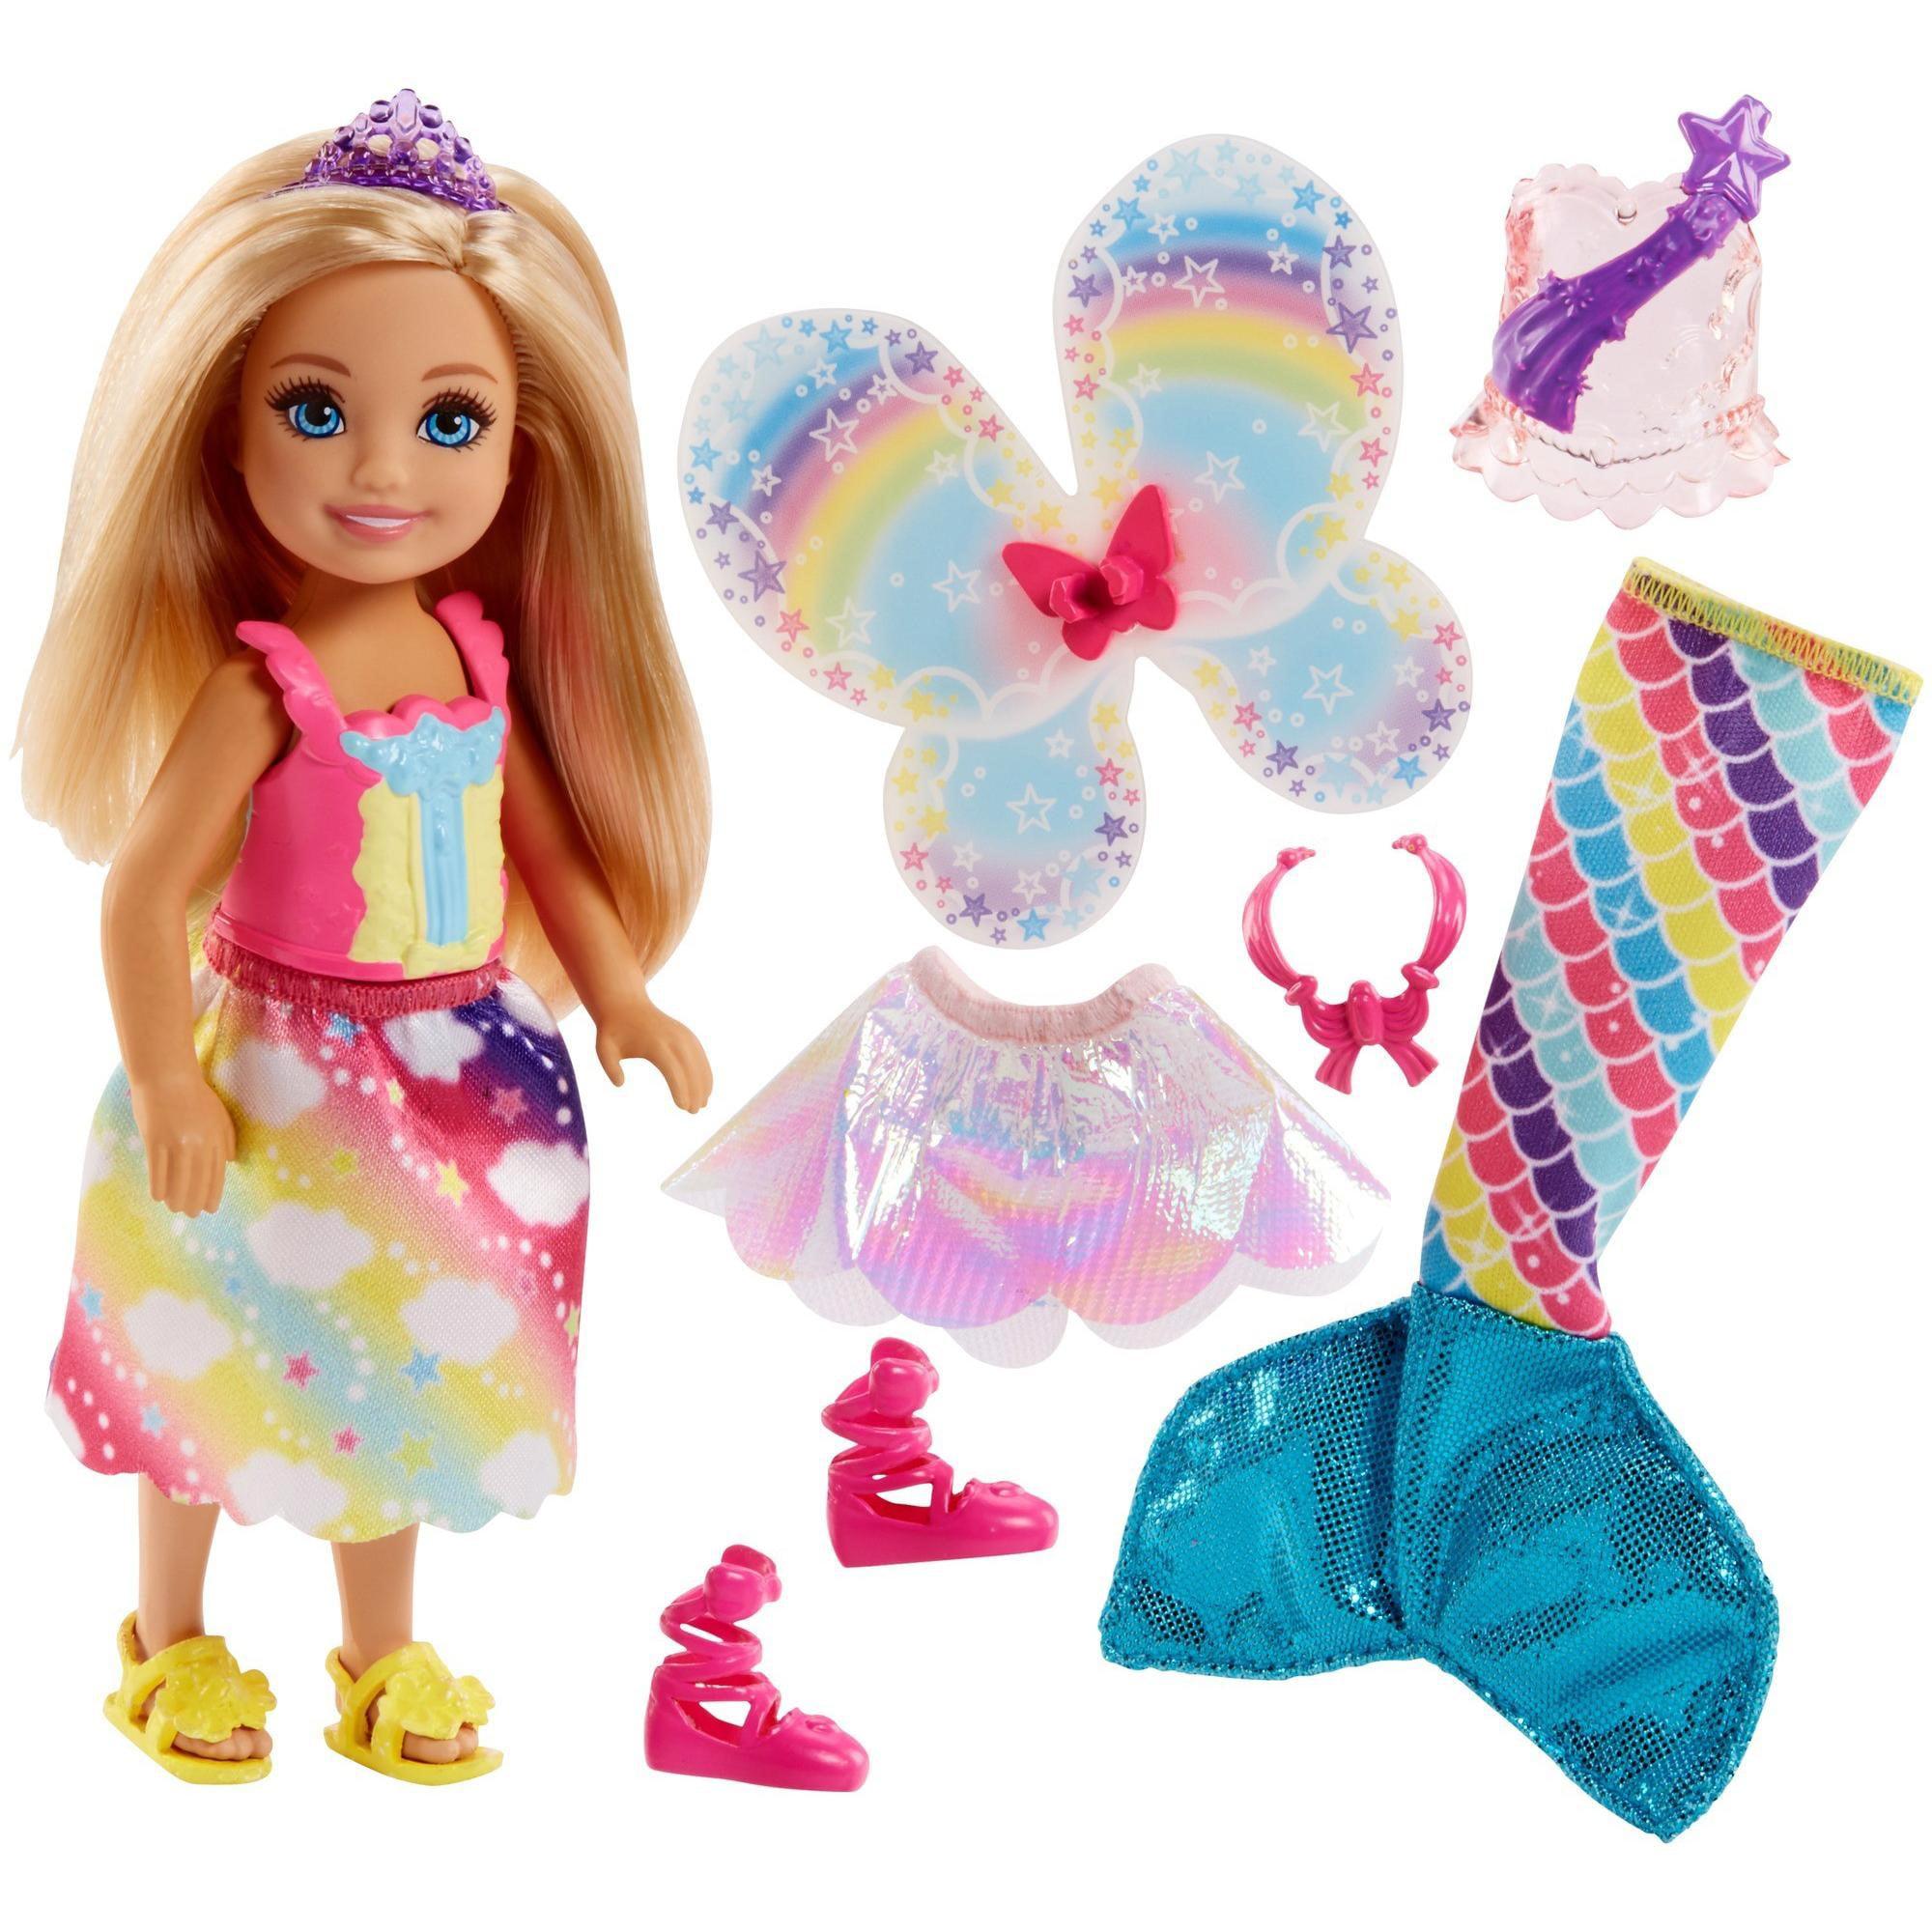 Barbie Rainbow Cove Chelsea Dress Up Doll With 3 Themed Outfits Walmart Com Walmart Com